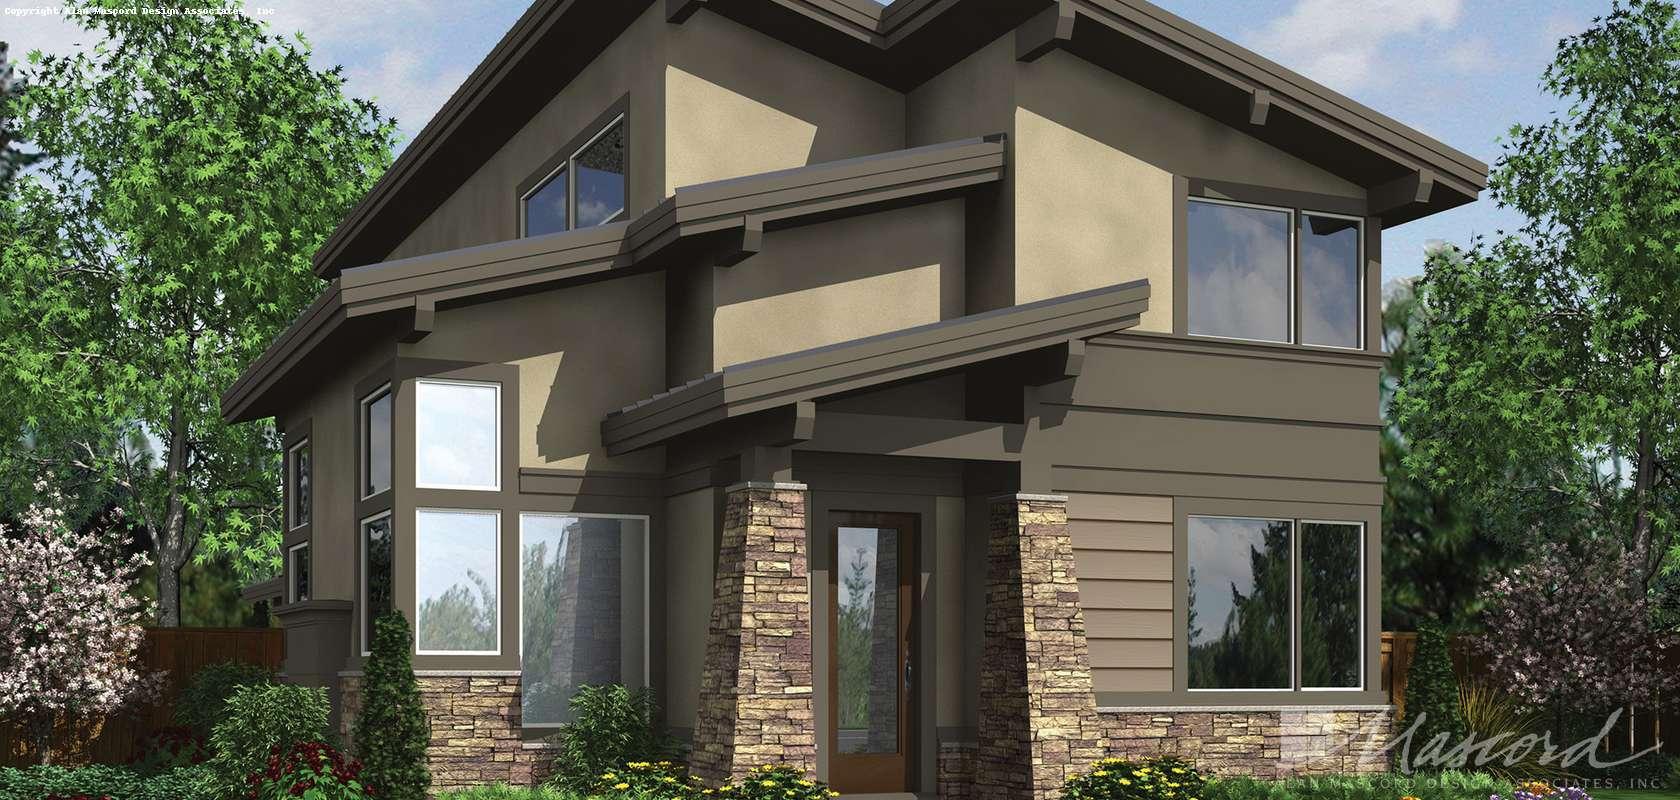 Mascord House Plan 21121: The Darbi